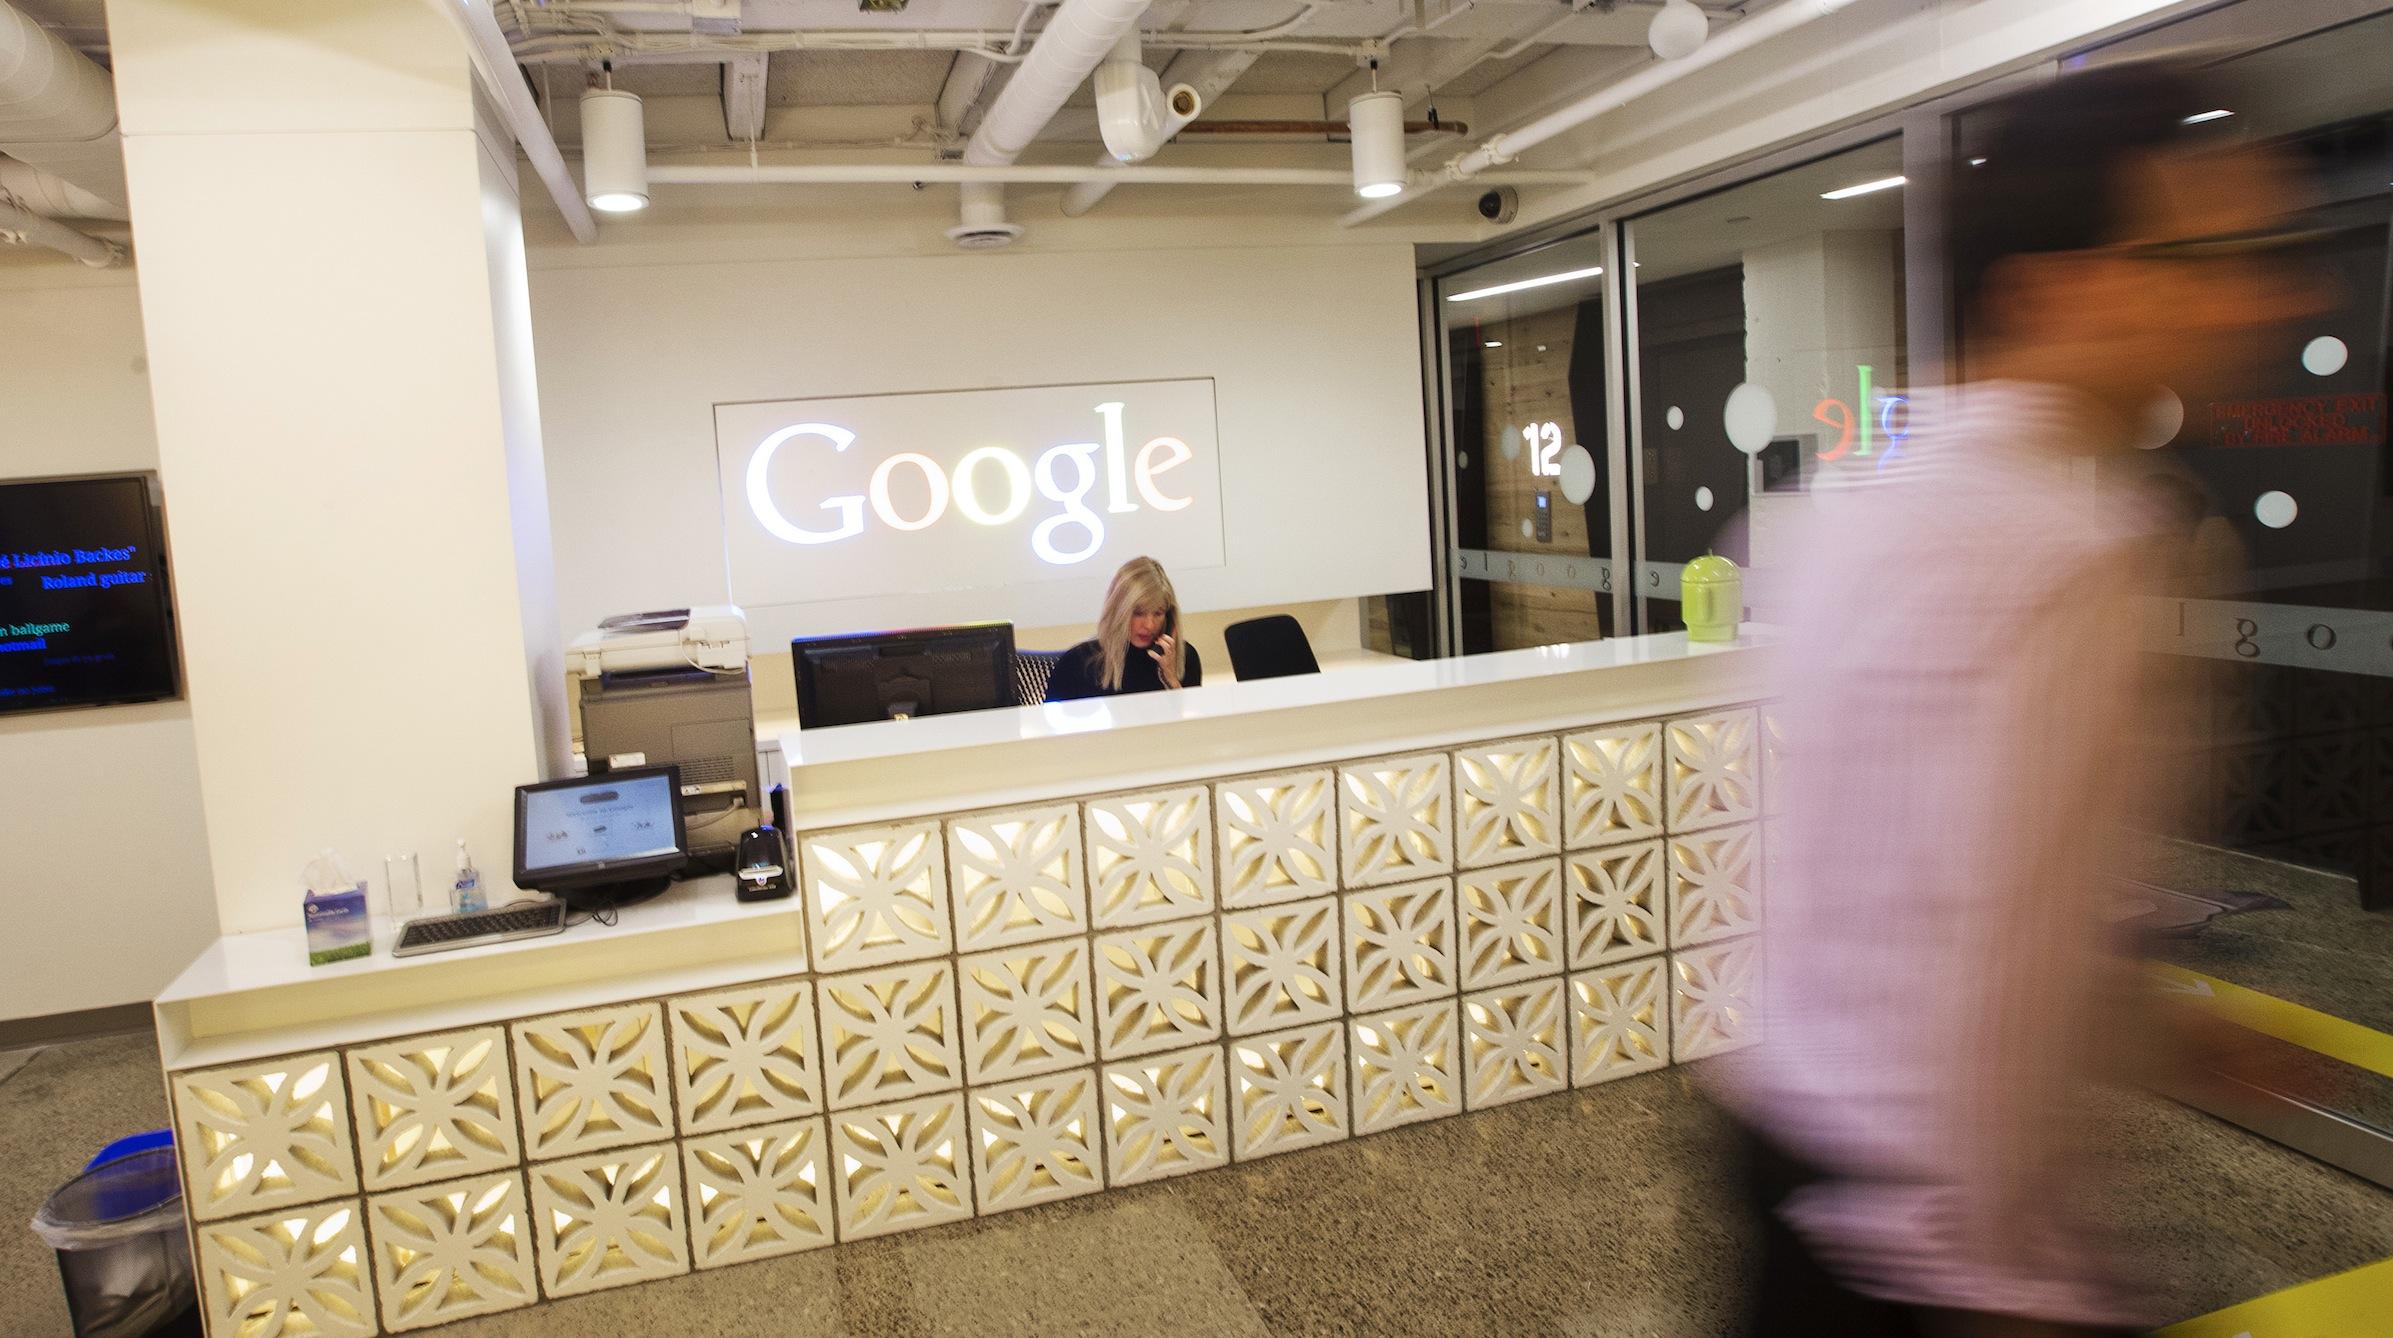 google office photos 13. A Man Walks By The Reception Desk At New Google Office In Toronto, November Photos 13